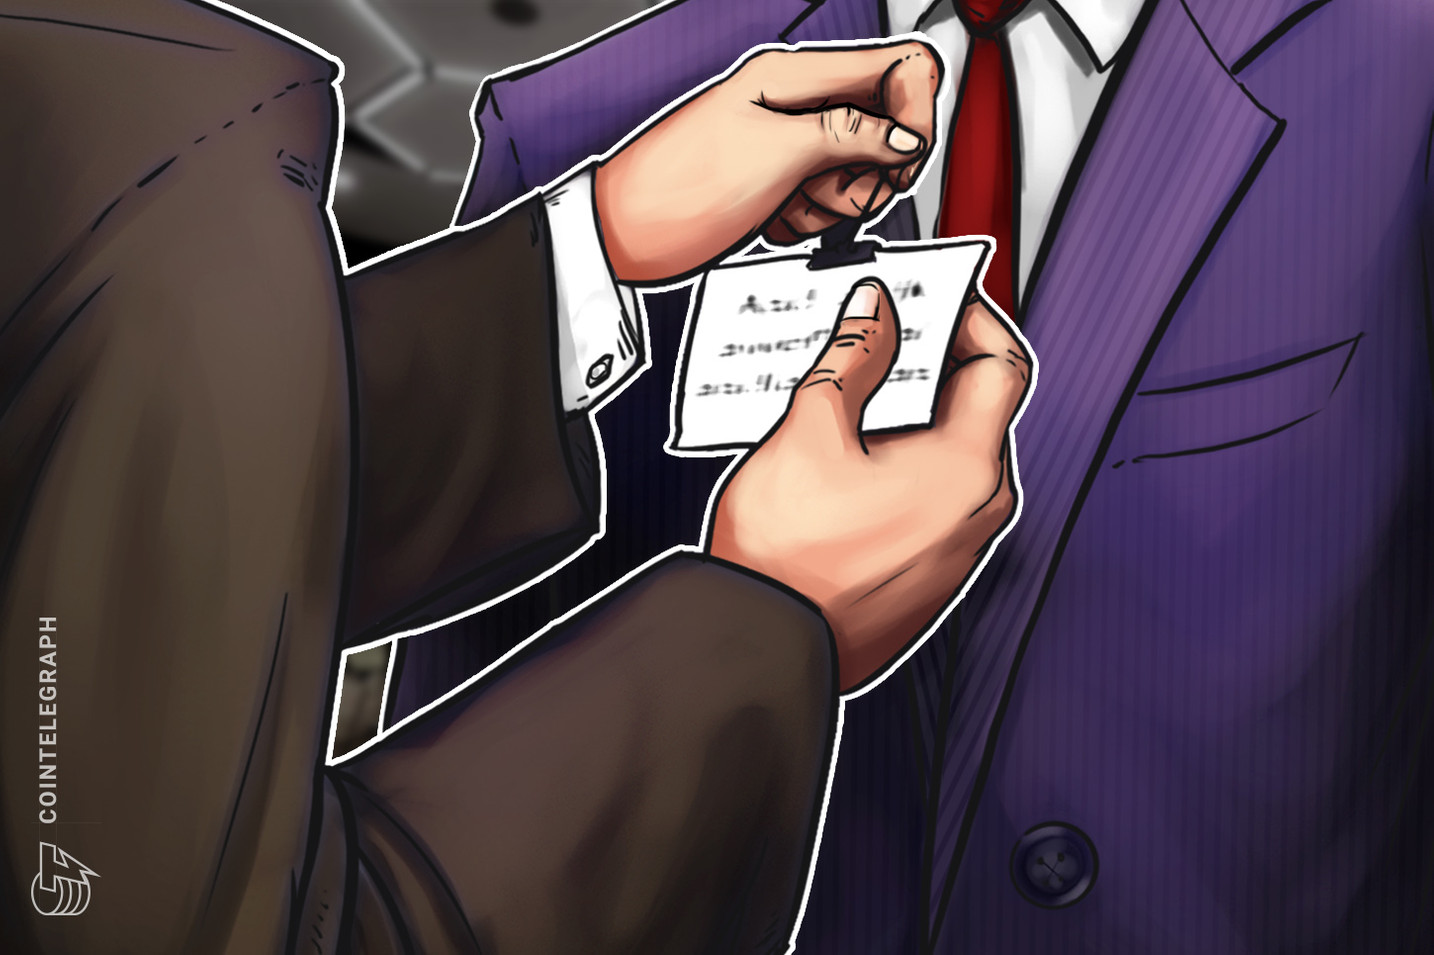 NYSE's former regulation head takes crypto job at Andreessen Horowitz